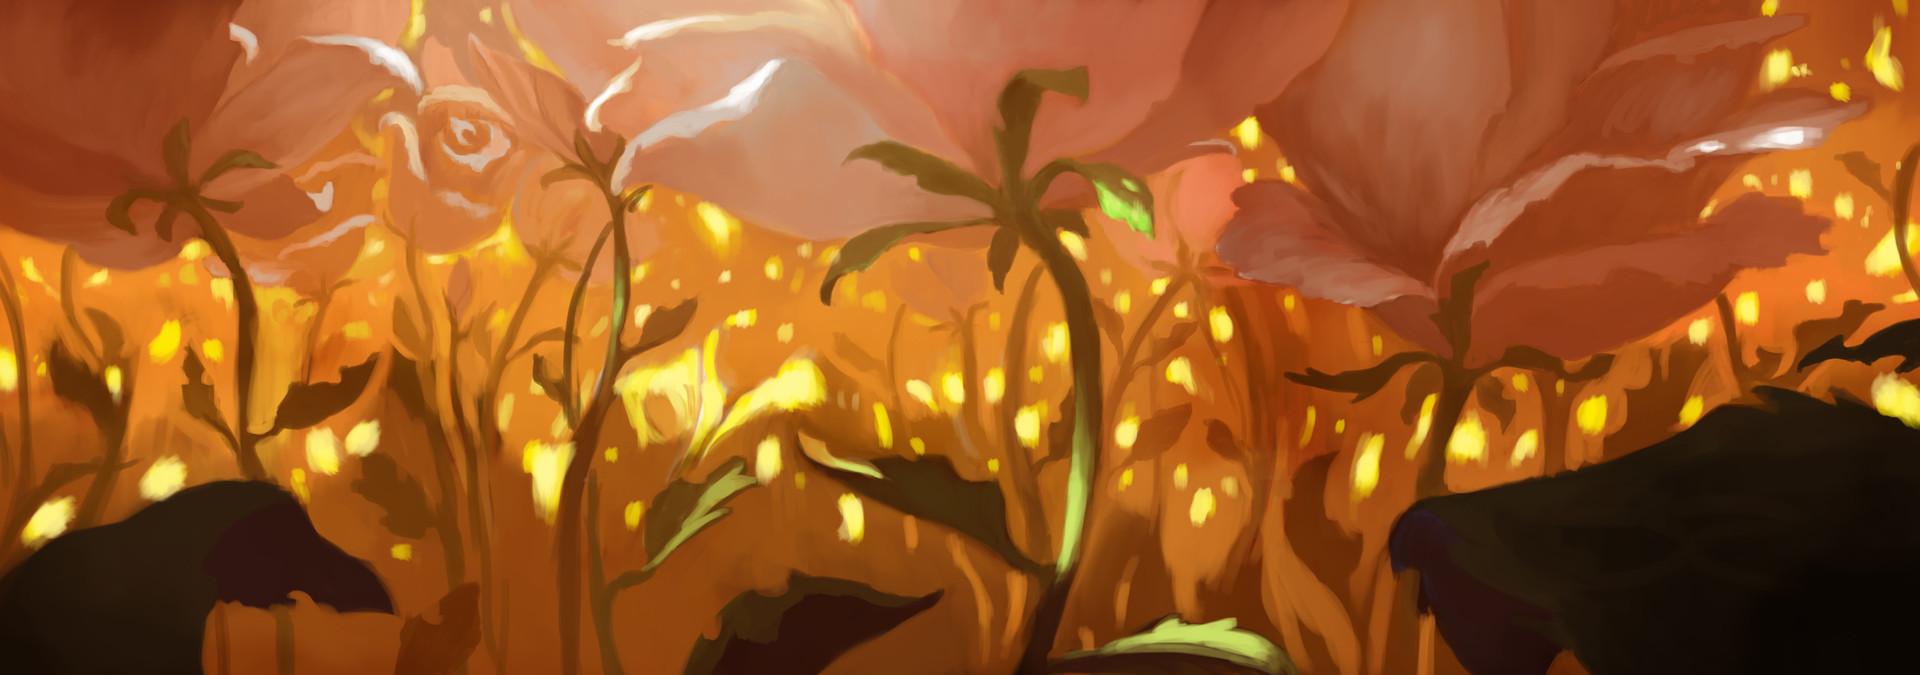 The Magical Flower by Kiarya : ImaginaryFlora